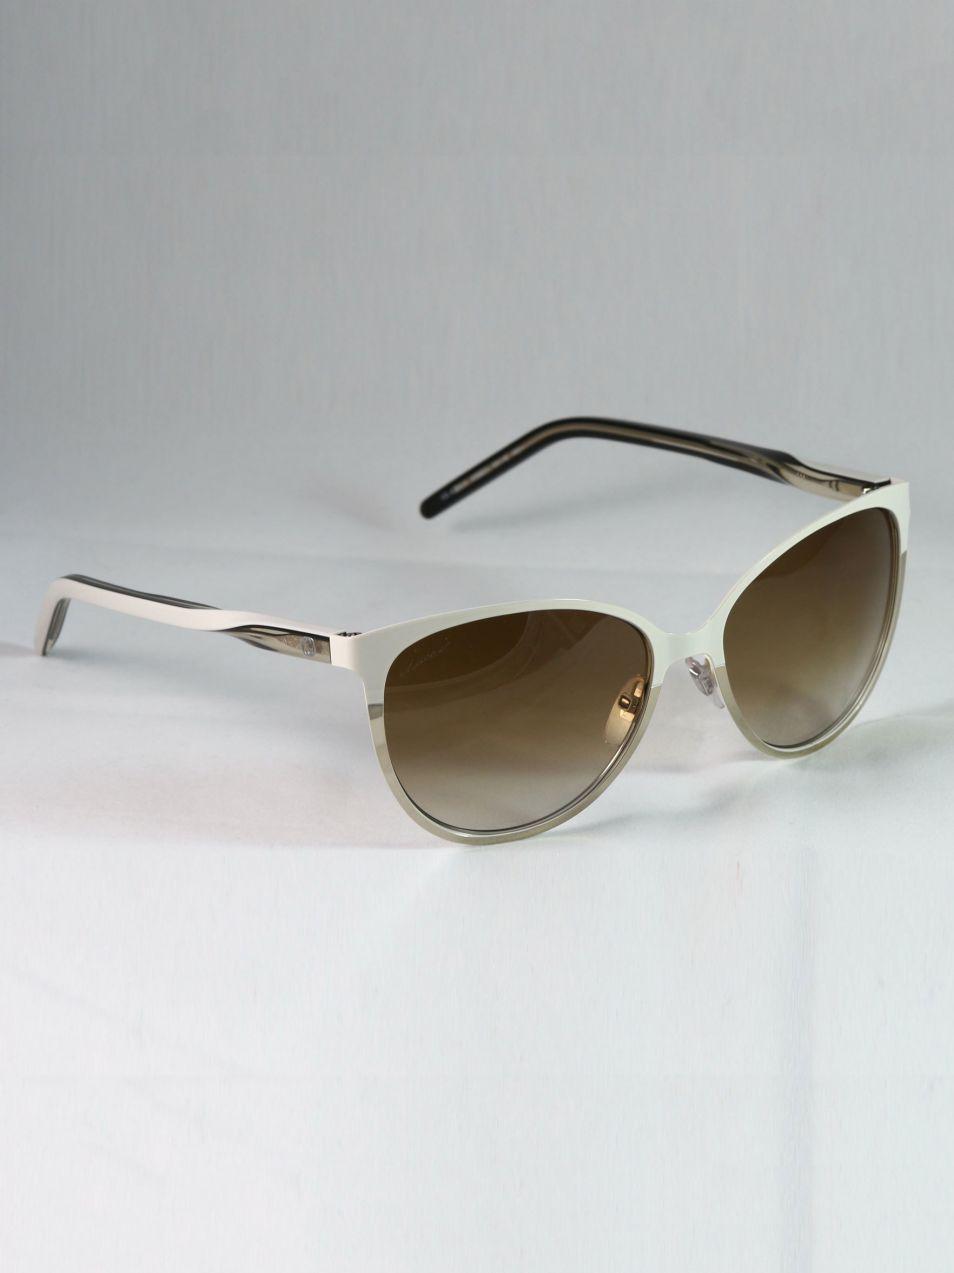 a9684aebb Gucci Dámske slnečné okuliare GG 4255 / S 4SM (6Y) značky Gucci - Lovely.sk